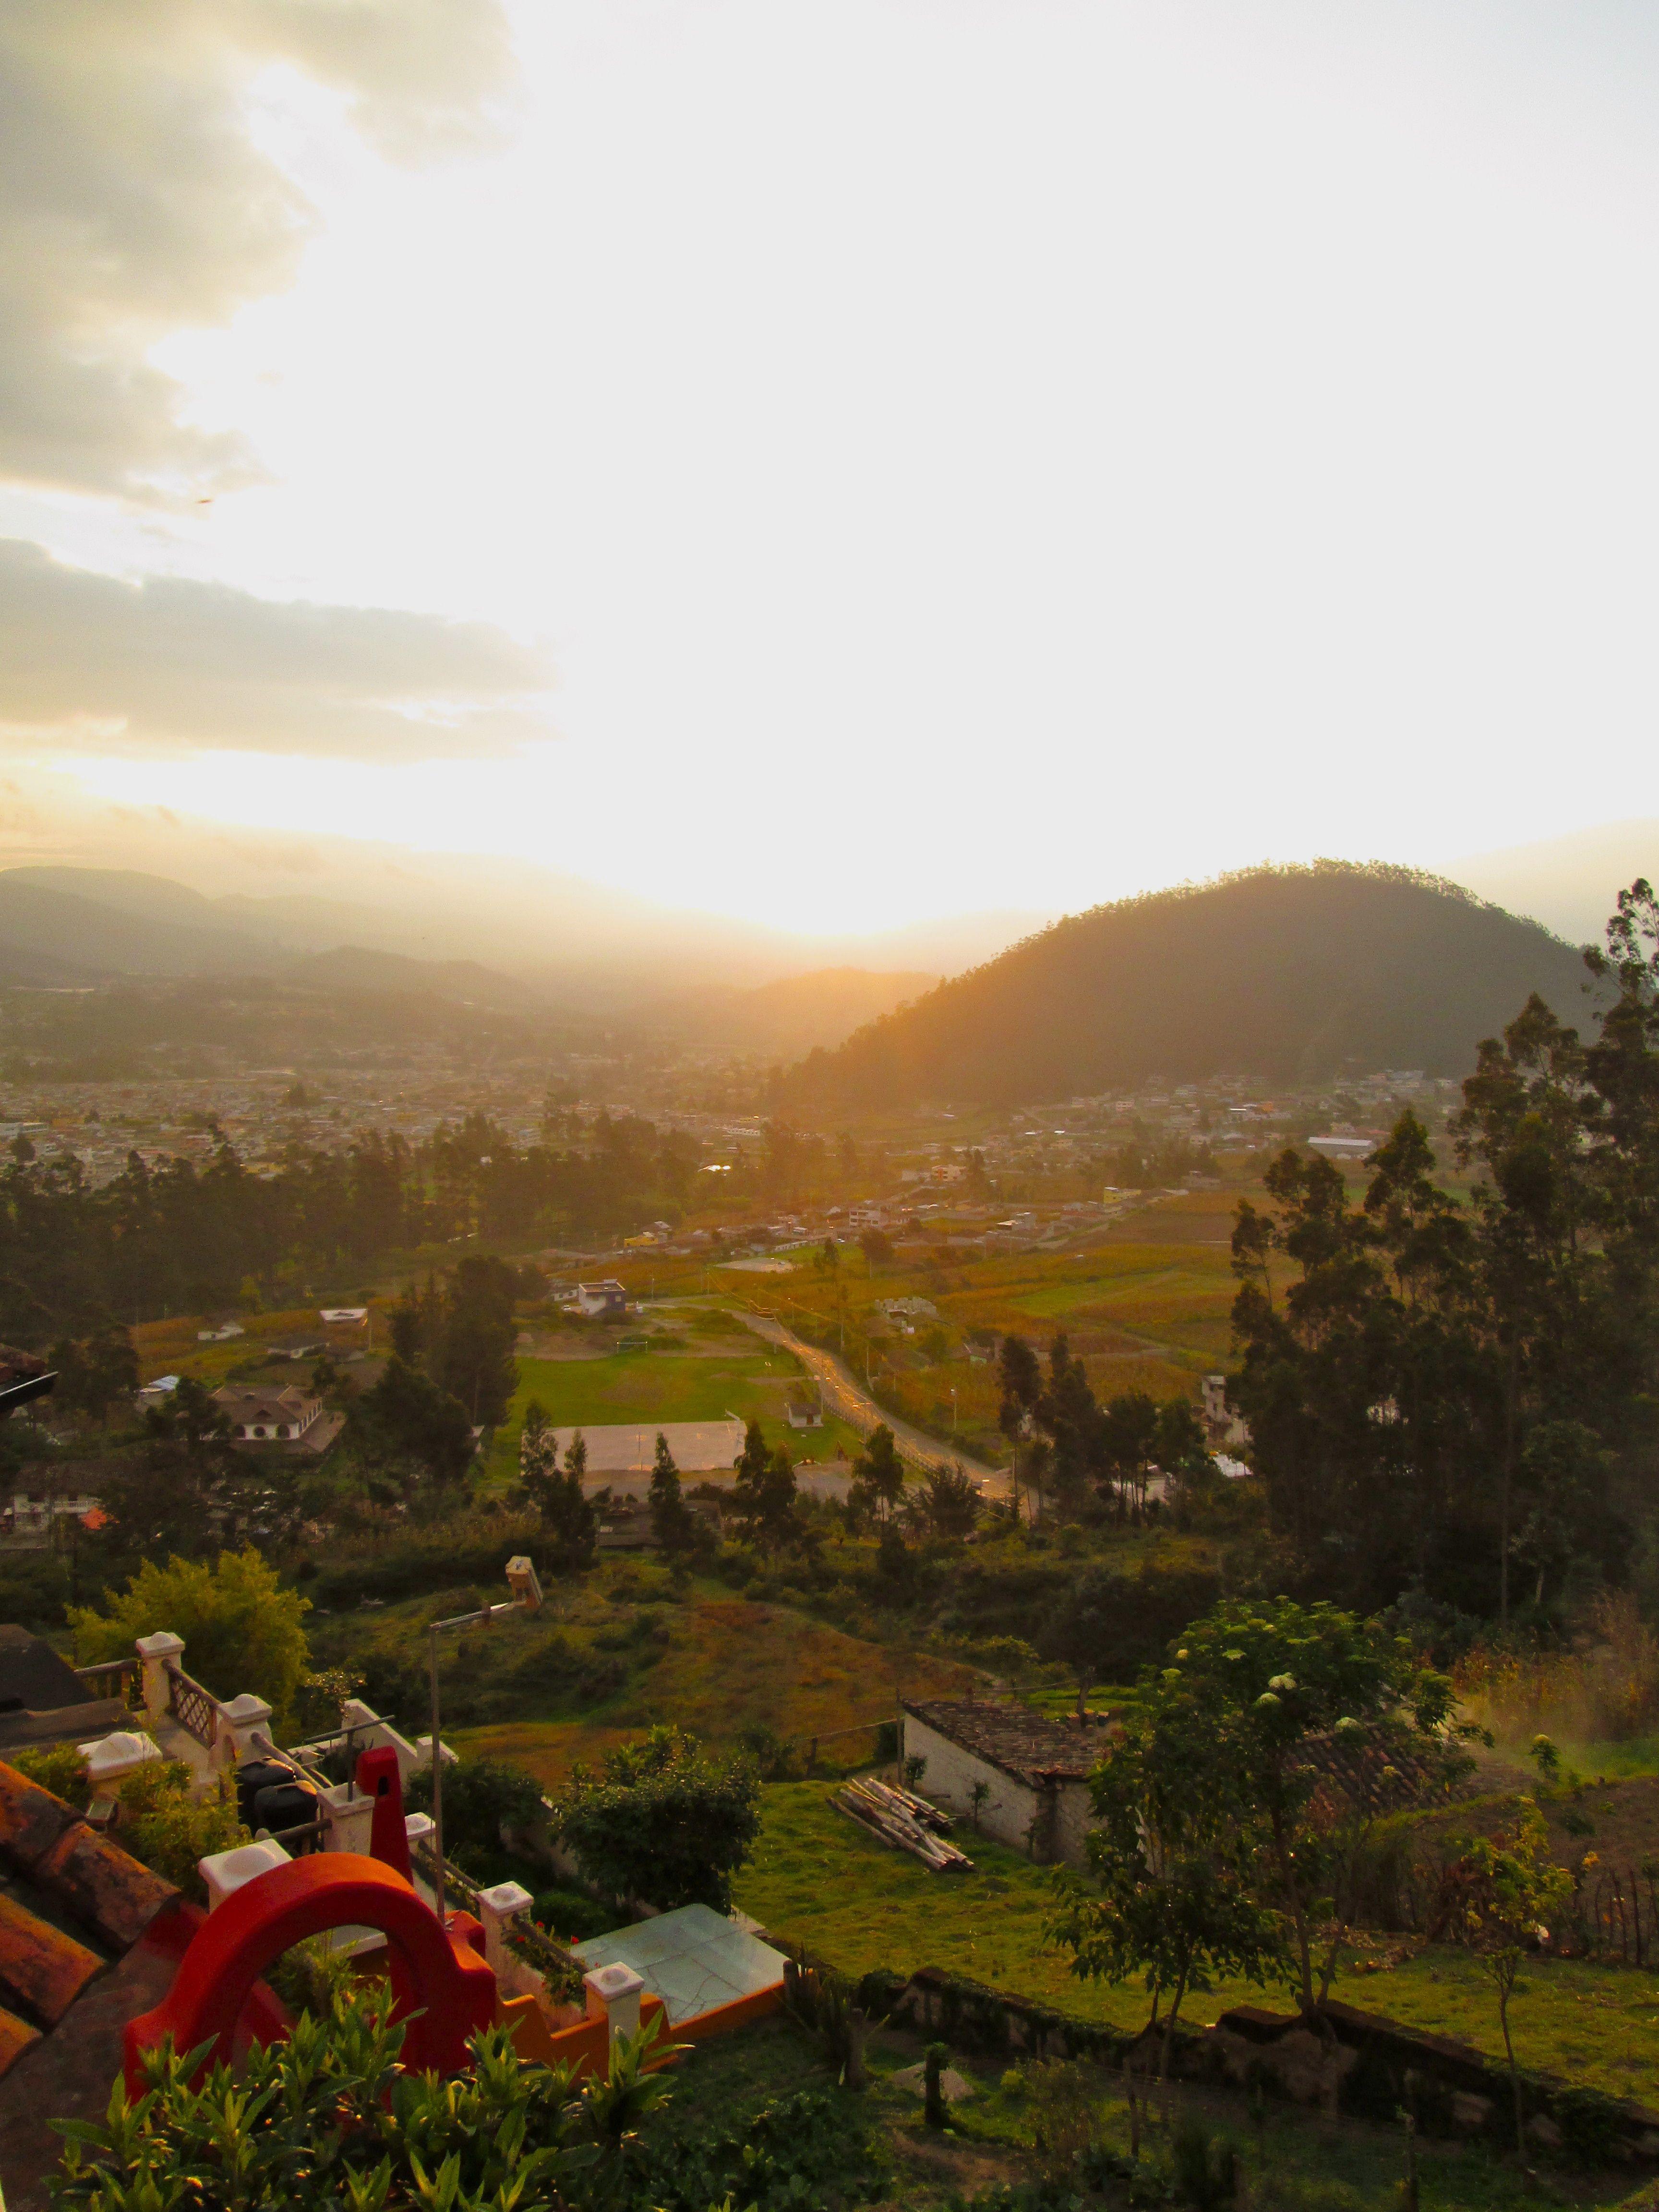 Kacy Warning Spring 2013 Sit Ecuador Culture And Development Landscapes Landmarks Otavalo Ecuador Sunset Over Landmarks Natural Landmarks Otavalo